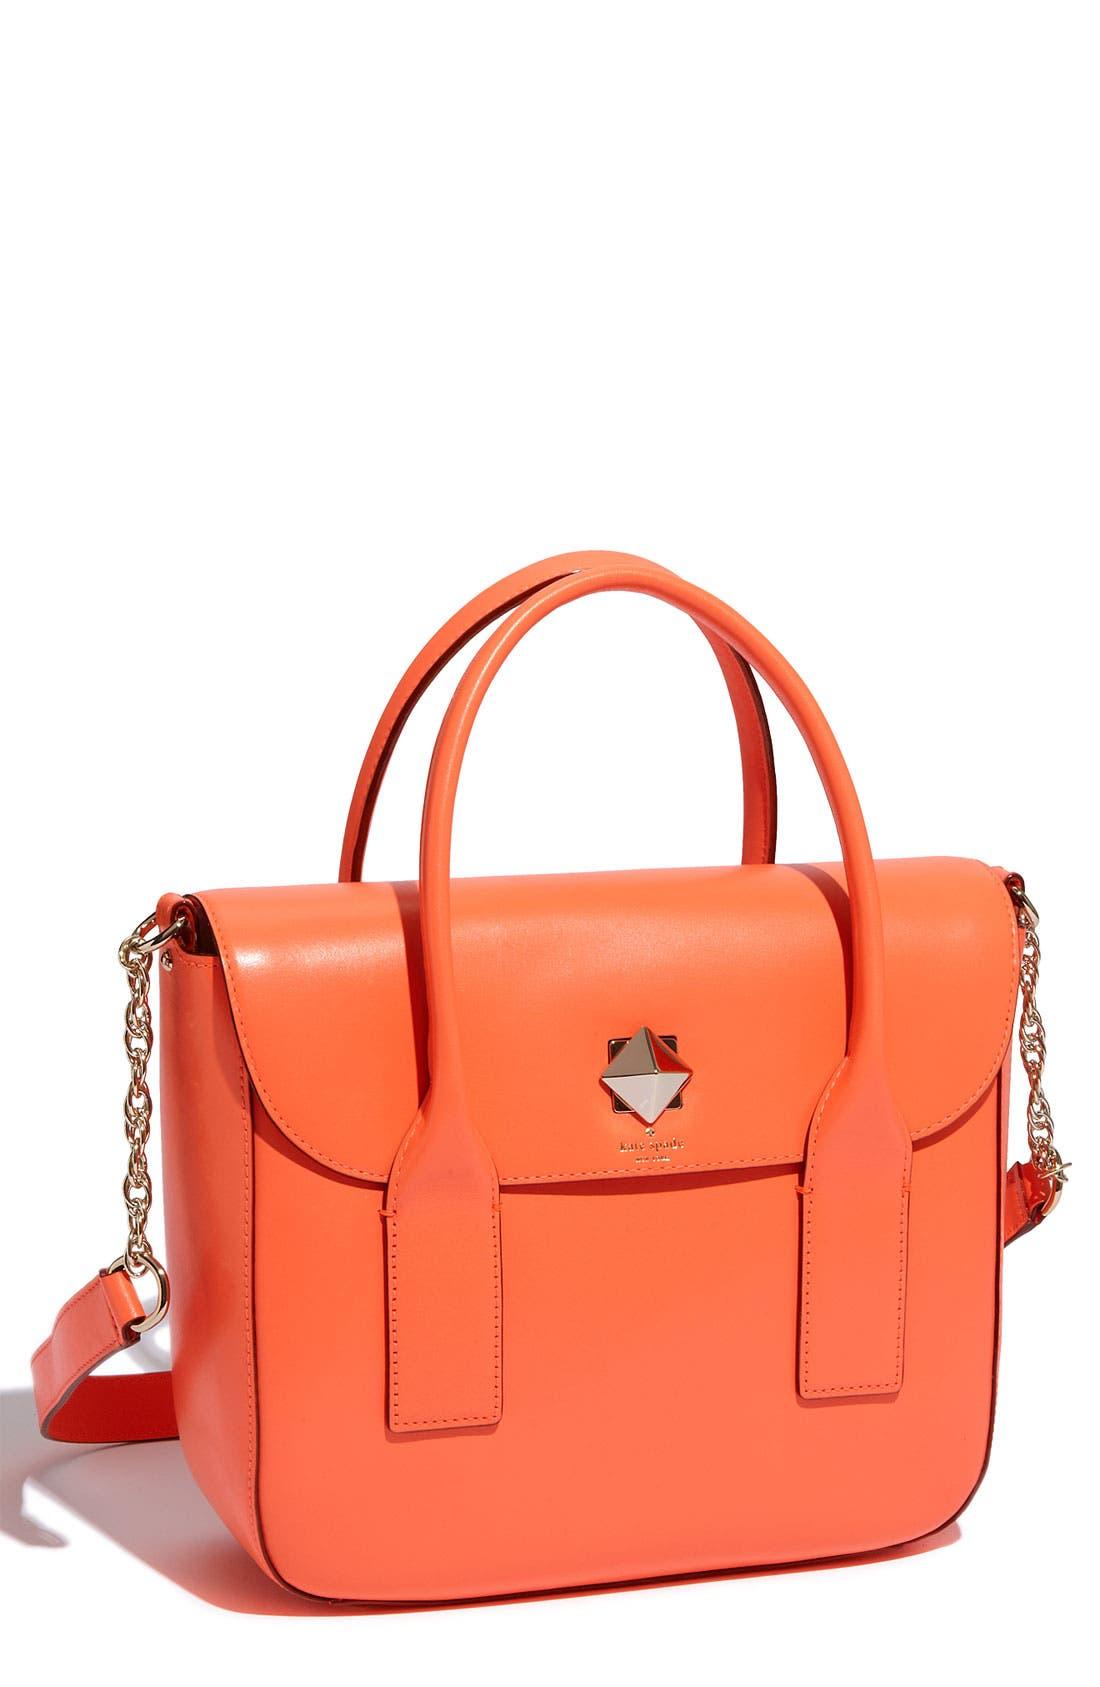 Alternate Image 1 Selected - kate spade new york 'new bond street - florence' satchel